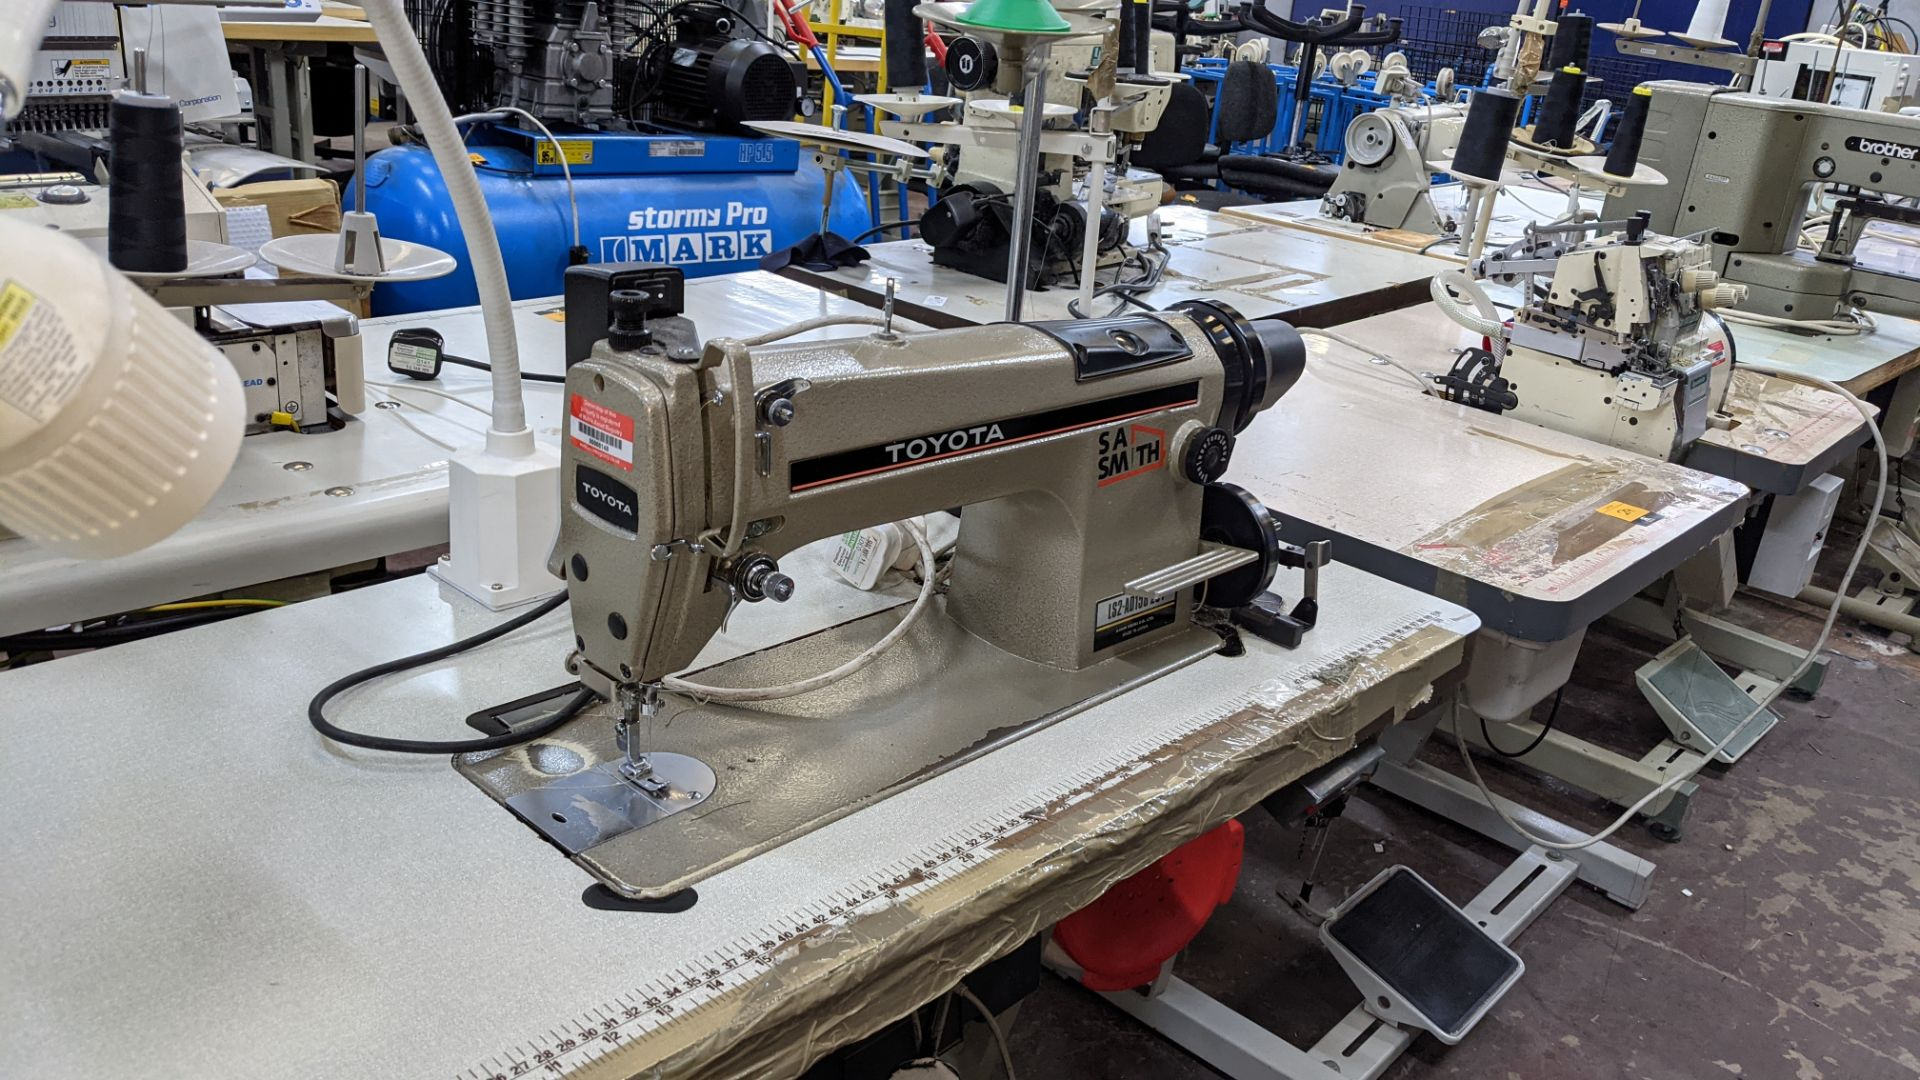 Toyota sewing machine - Image 9 of 17